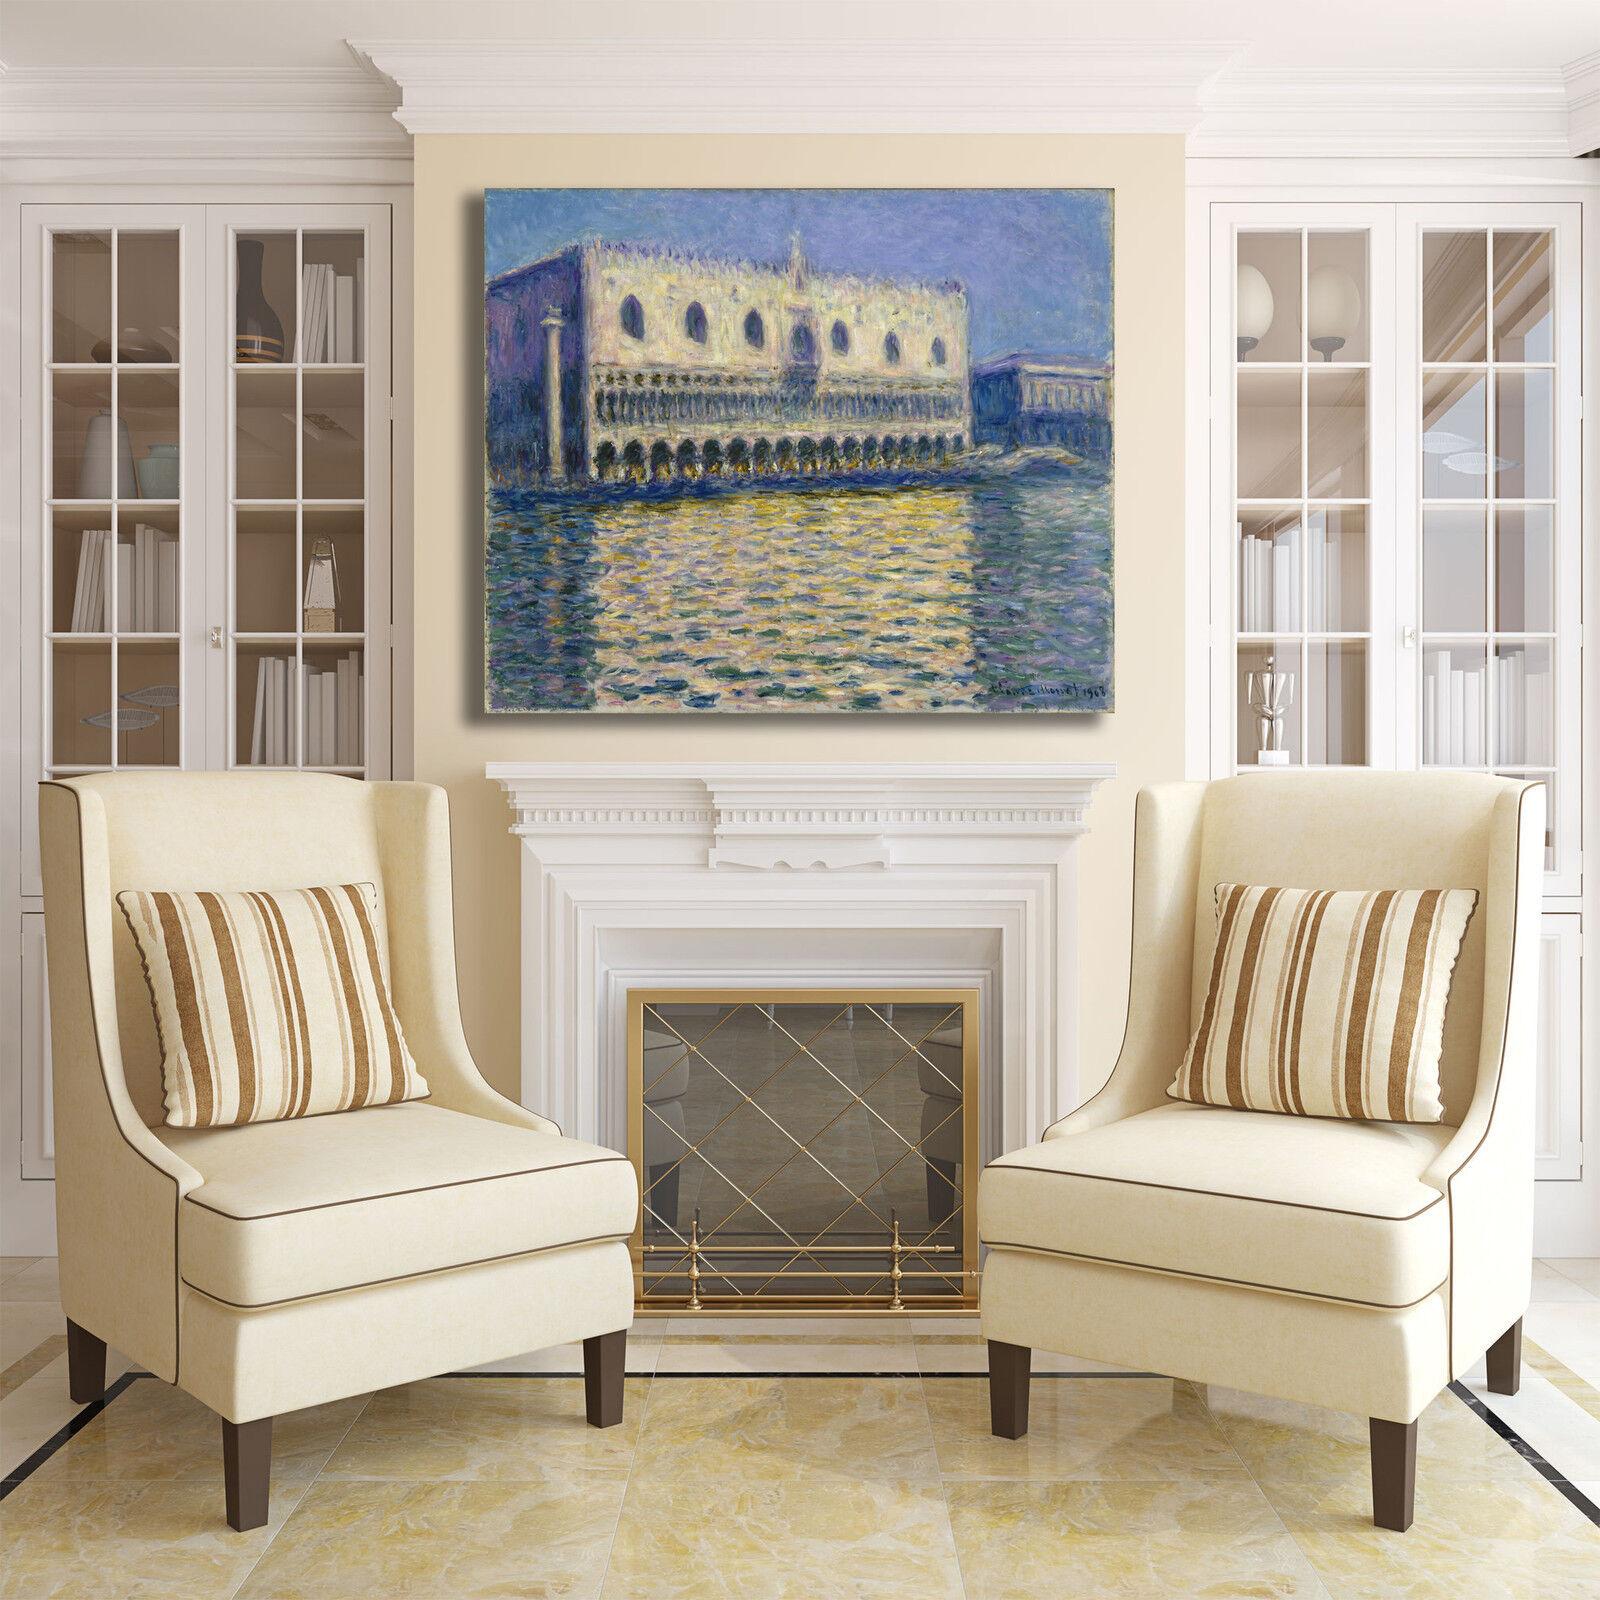 Monet il palazzo ducale design quadro stampa tela telaio dipinto telaio tela arRouge o casa 5b31eb